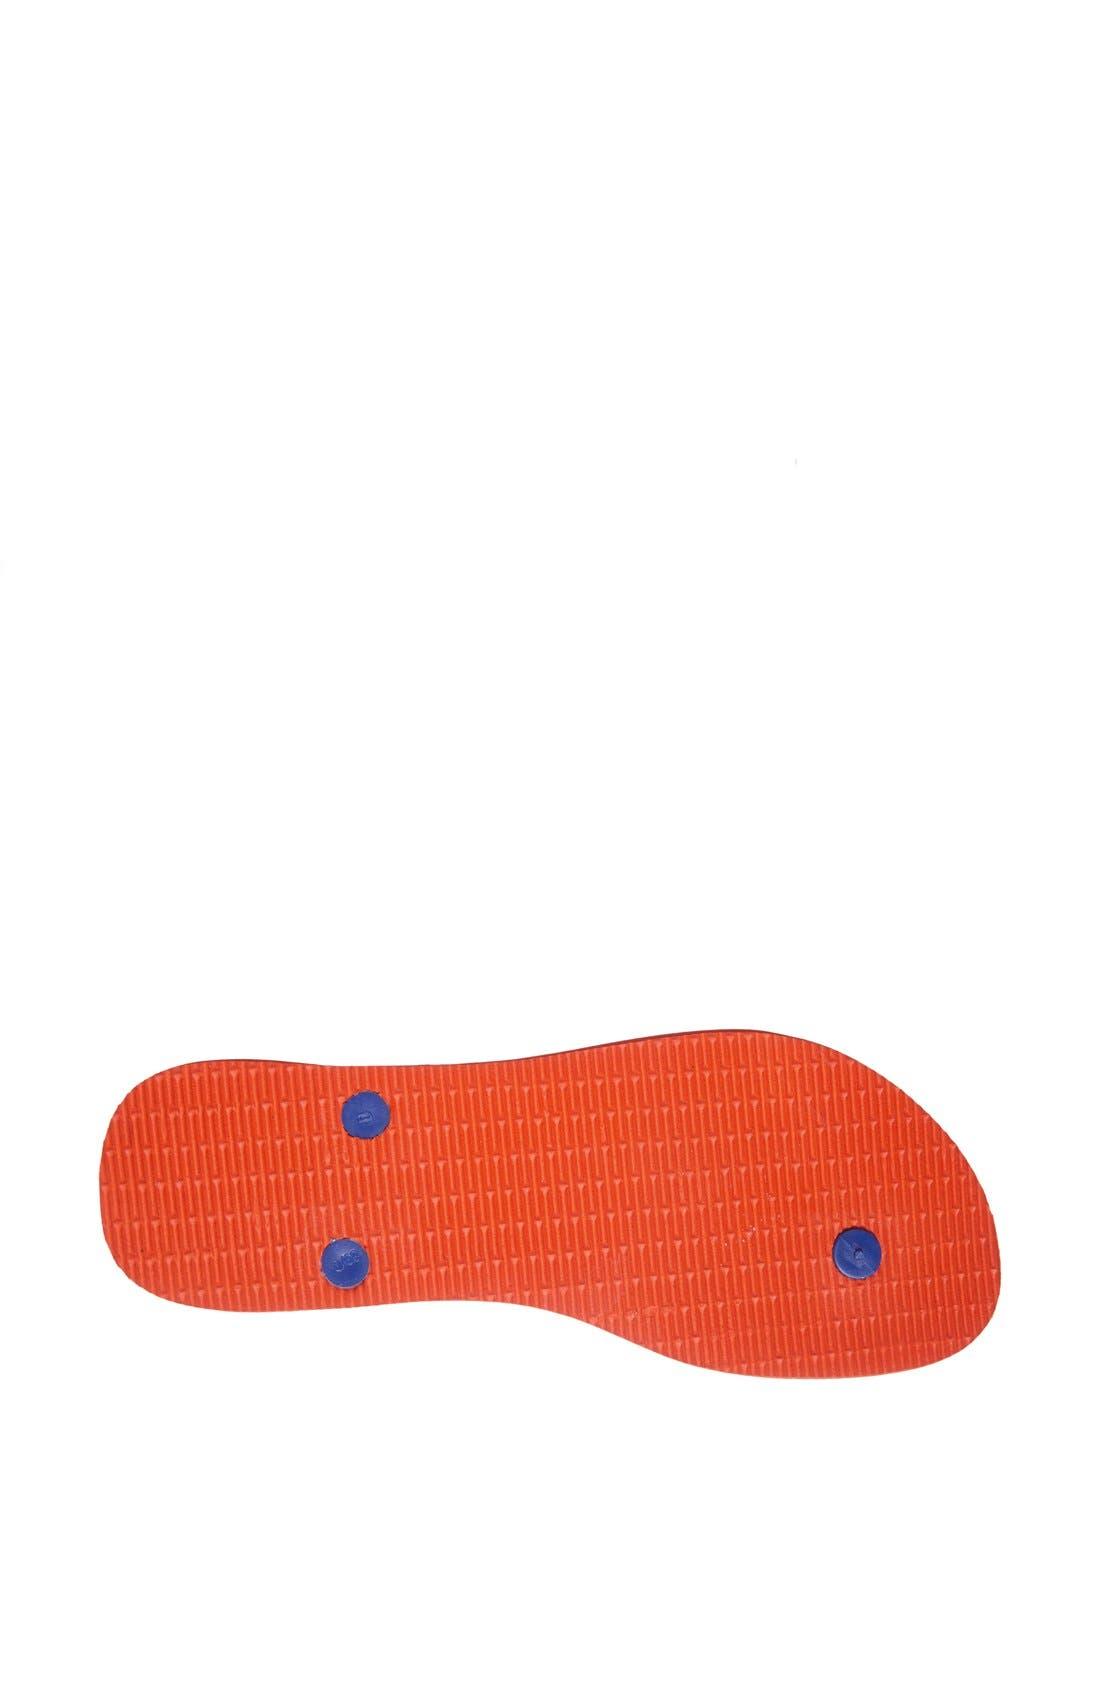 Alternate Image 4  - Havaianas 'Slim Lace' Flip Flop (Women)